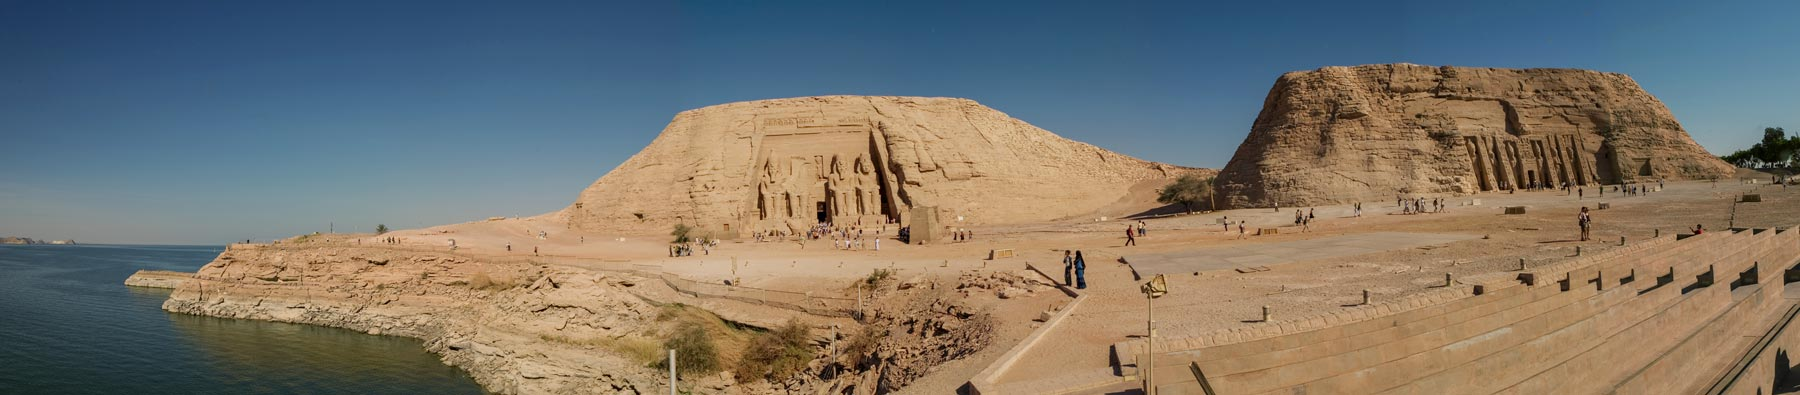 I01 Abu Simbel